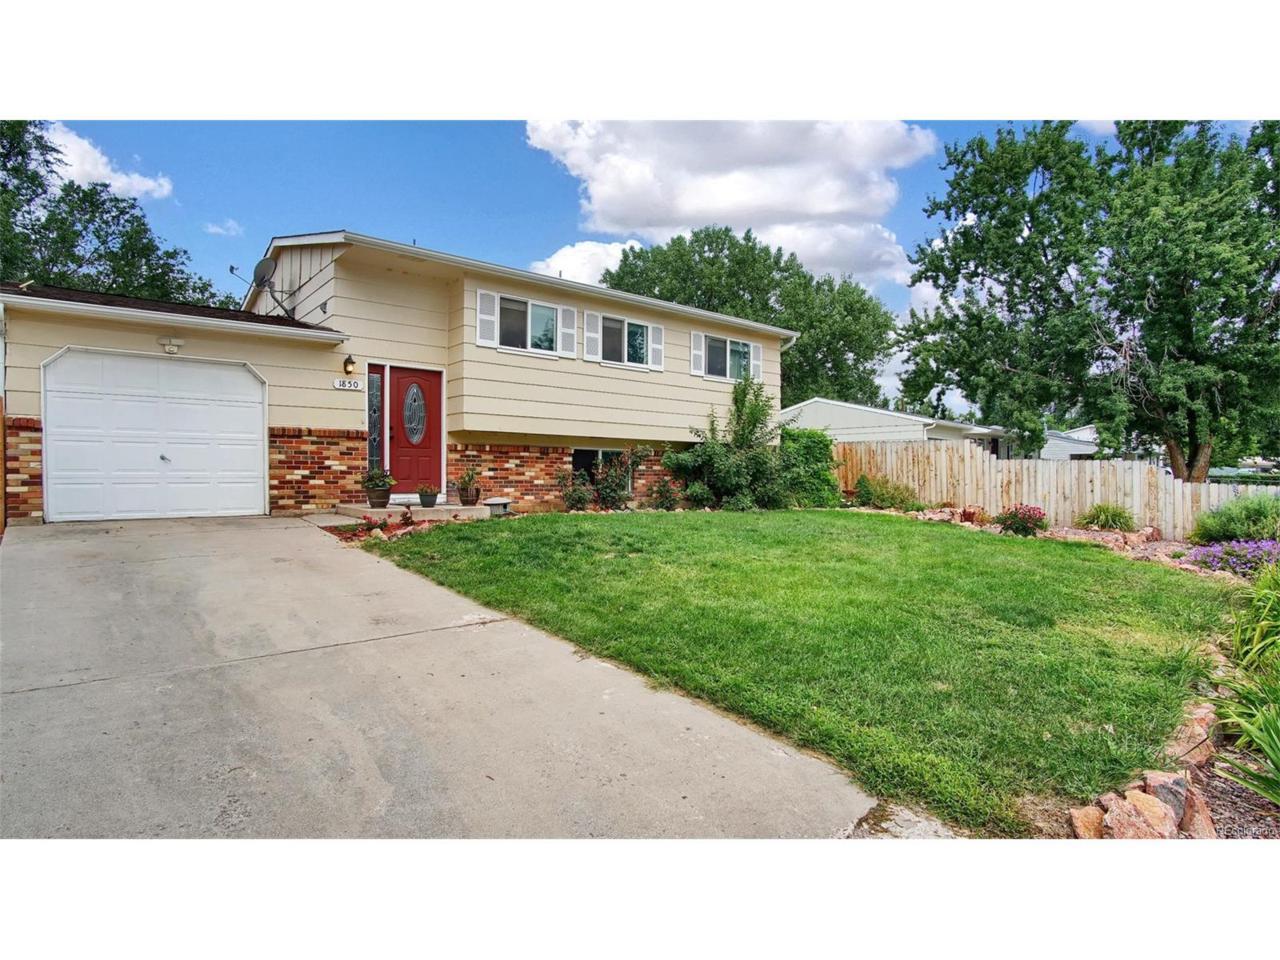 1850 Bonita Drive, Fountain, CO 80817 (MLS #9159599) :: 8z Real Estate